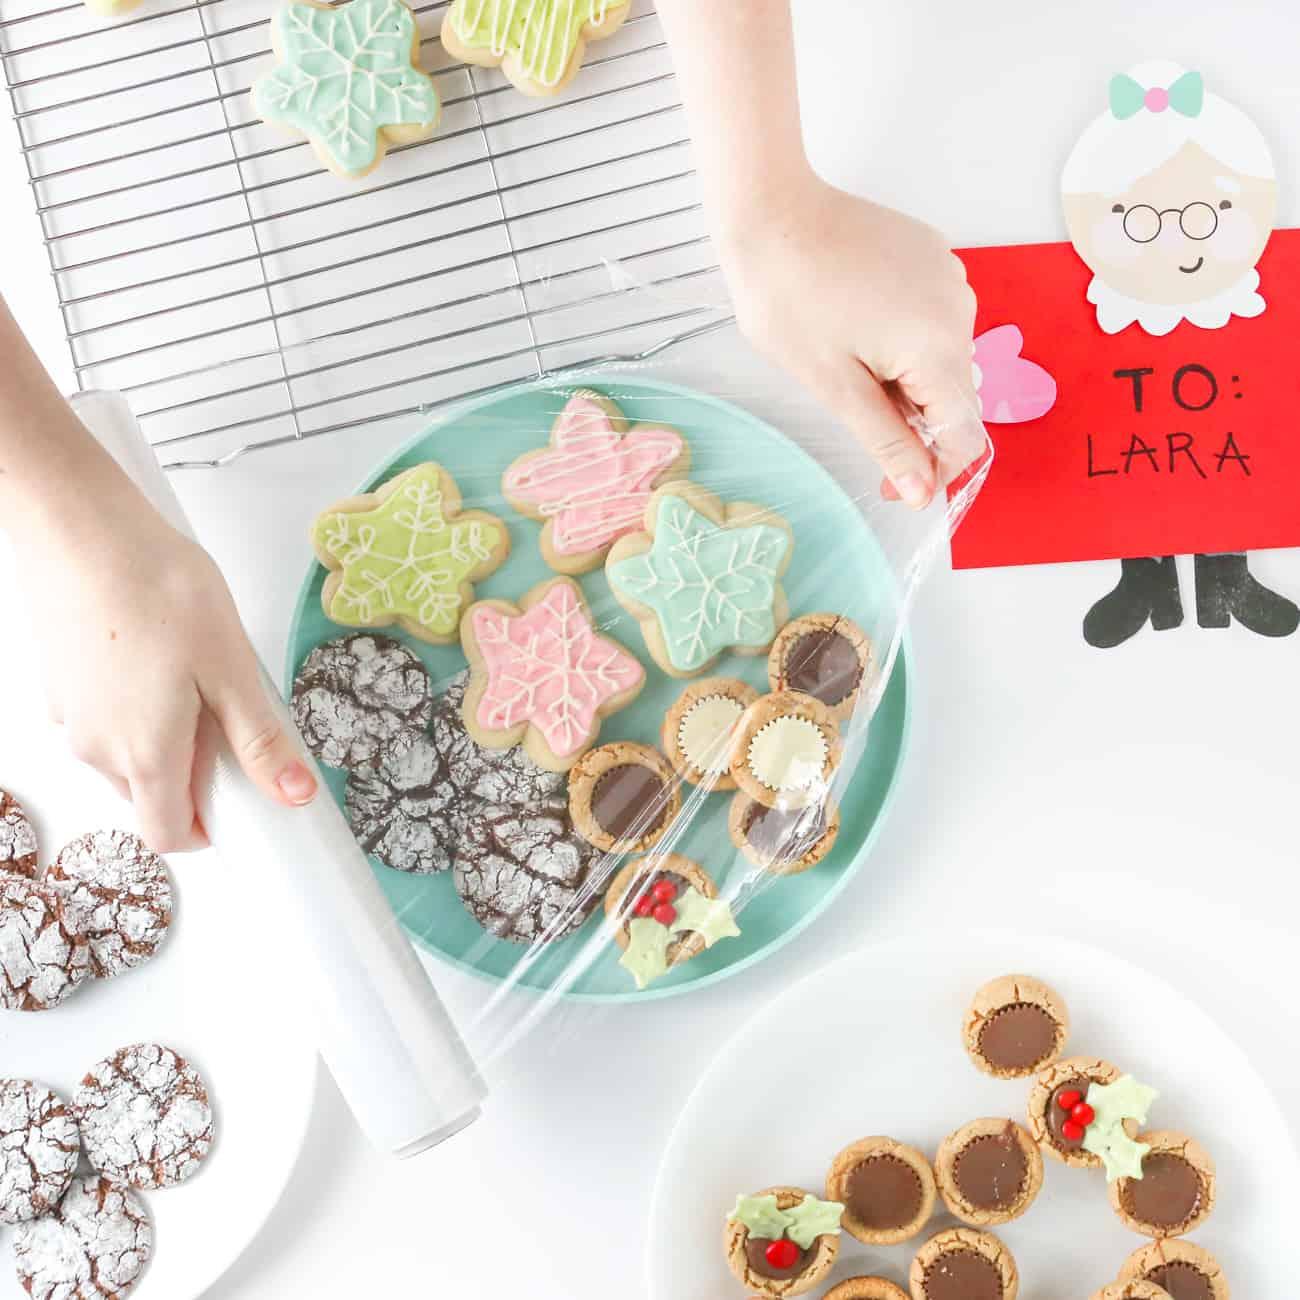 3 Diy Cookie Tray Ideas Free Printables